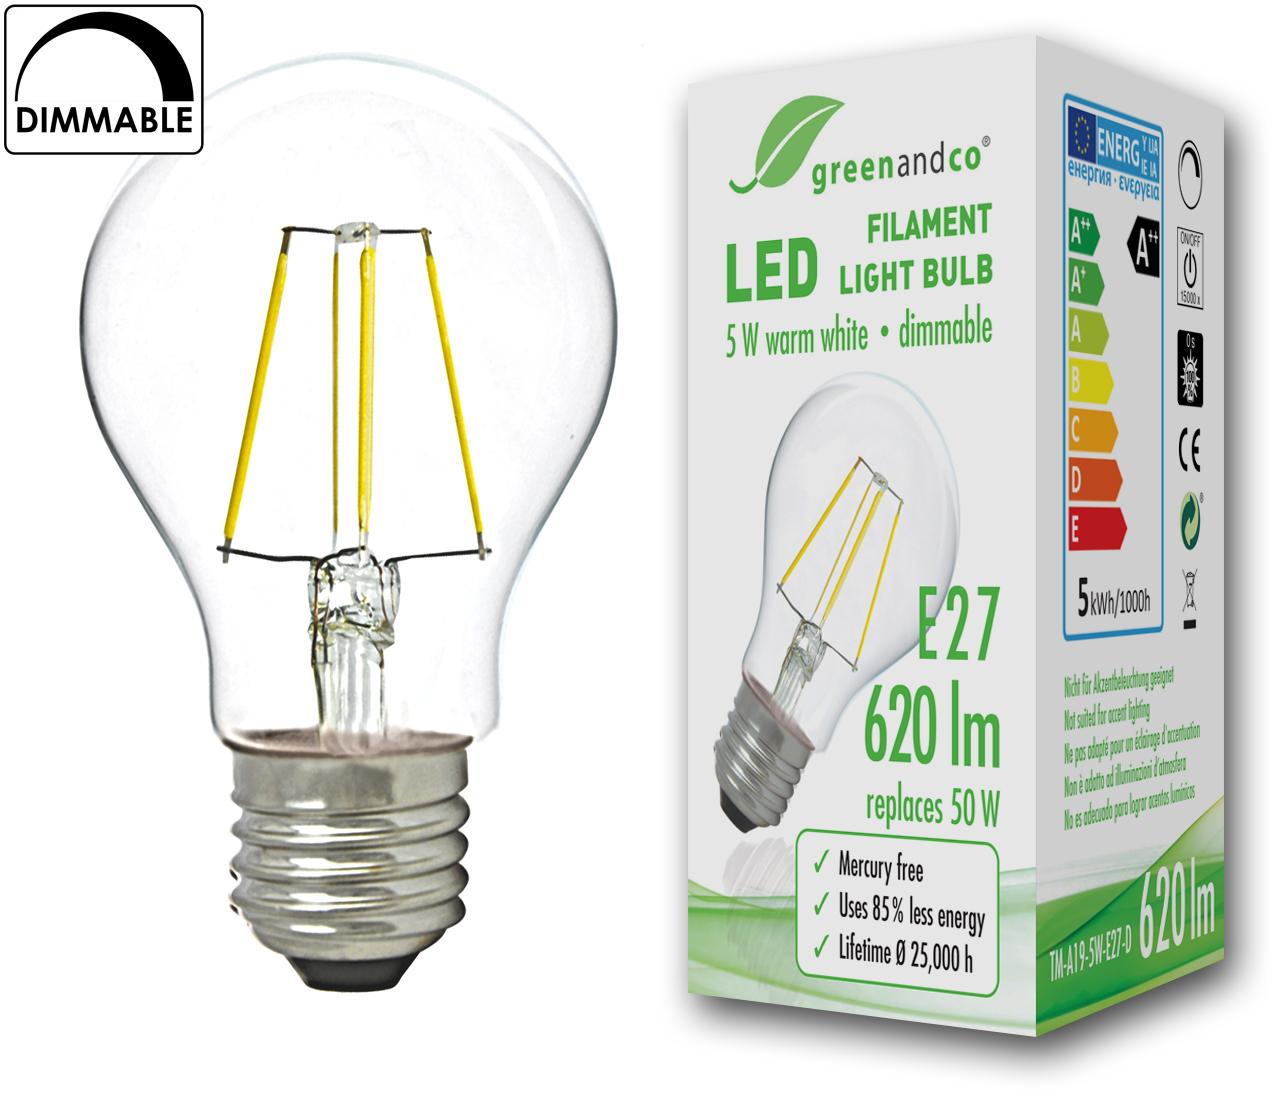 Glühfaden LED Lampe dimmbar ersetzt 50W E27 5W 620lm 2700K warmweiß ...